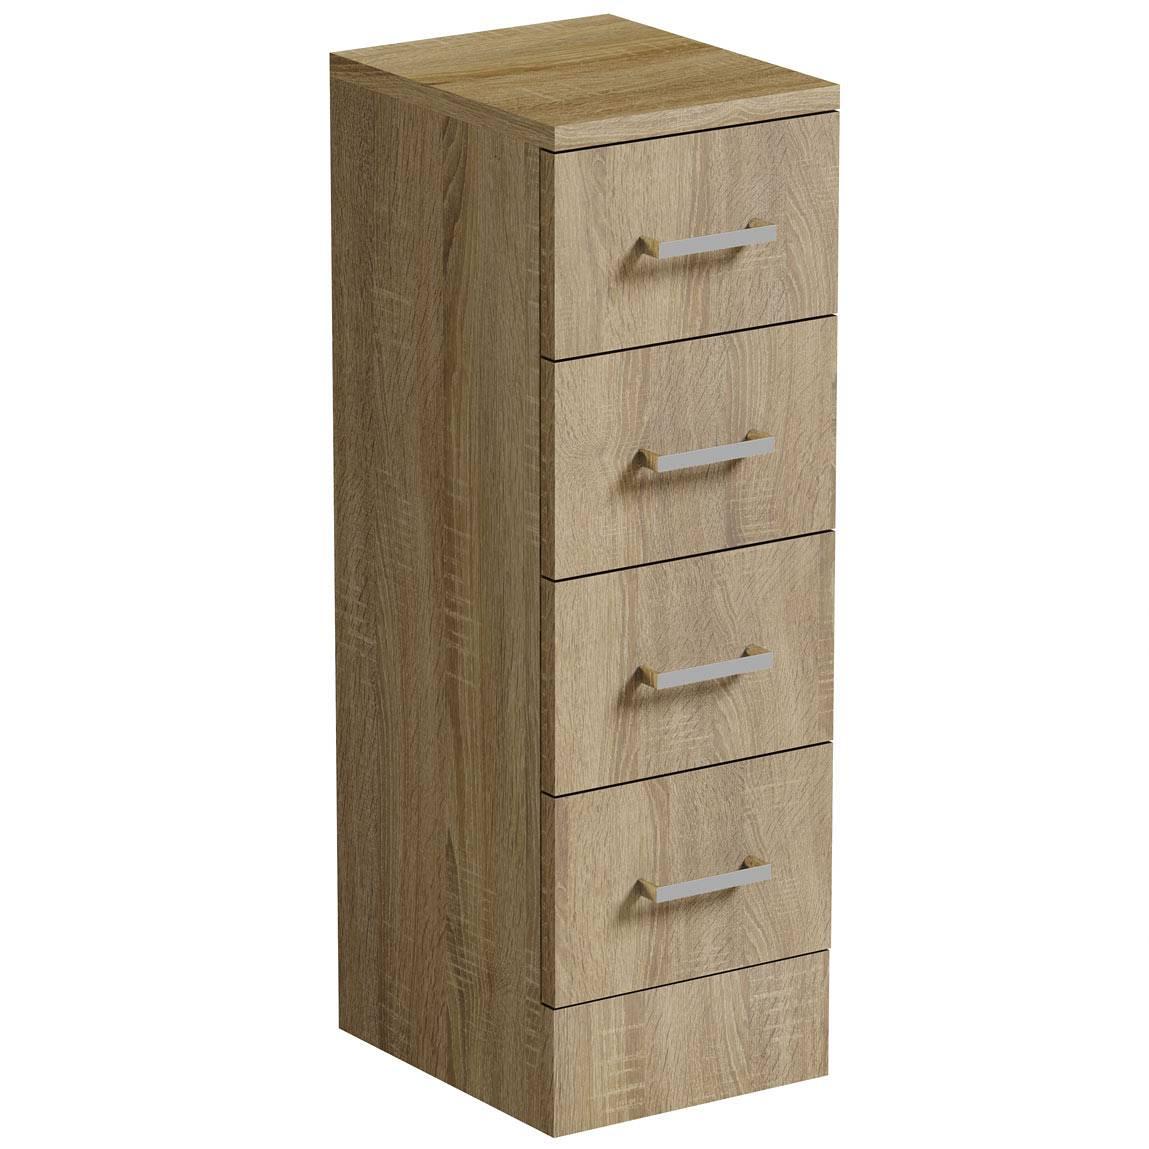 Image of Sienna Oak Multi Drawer Unit 300